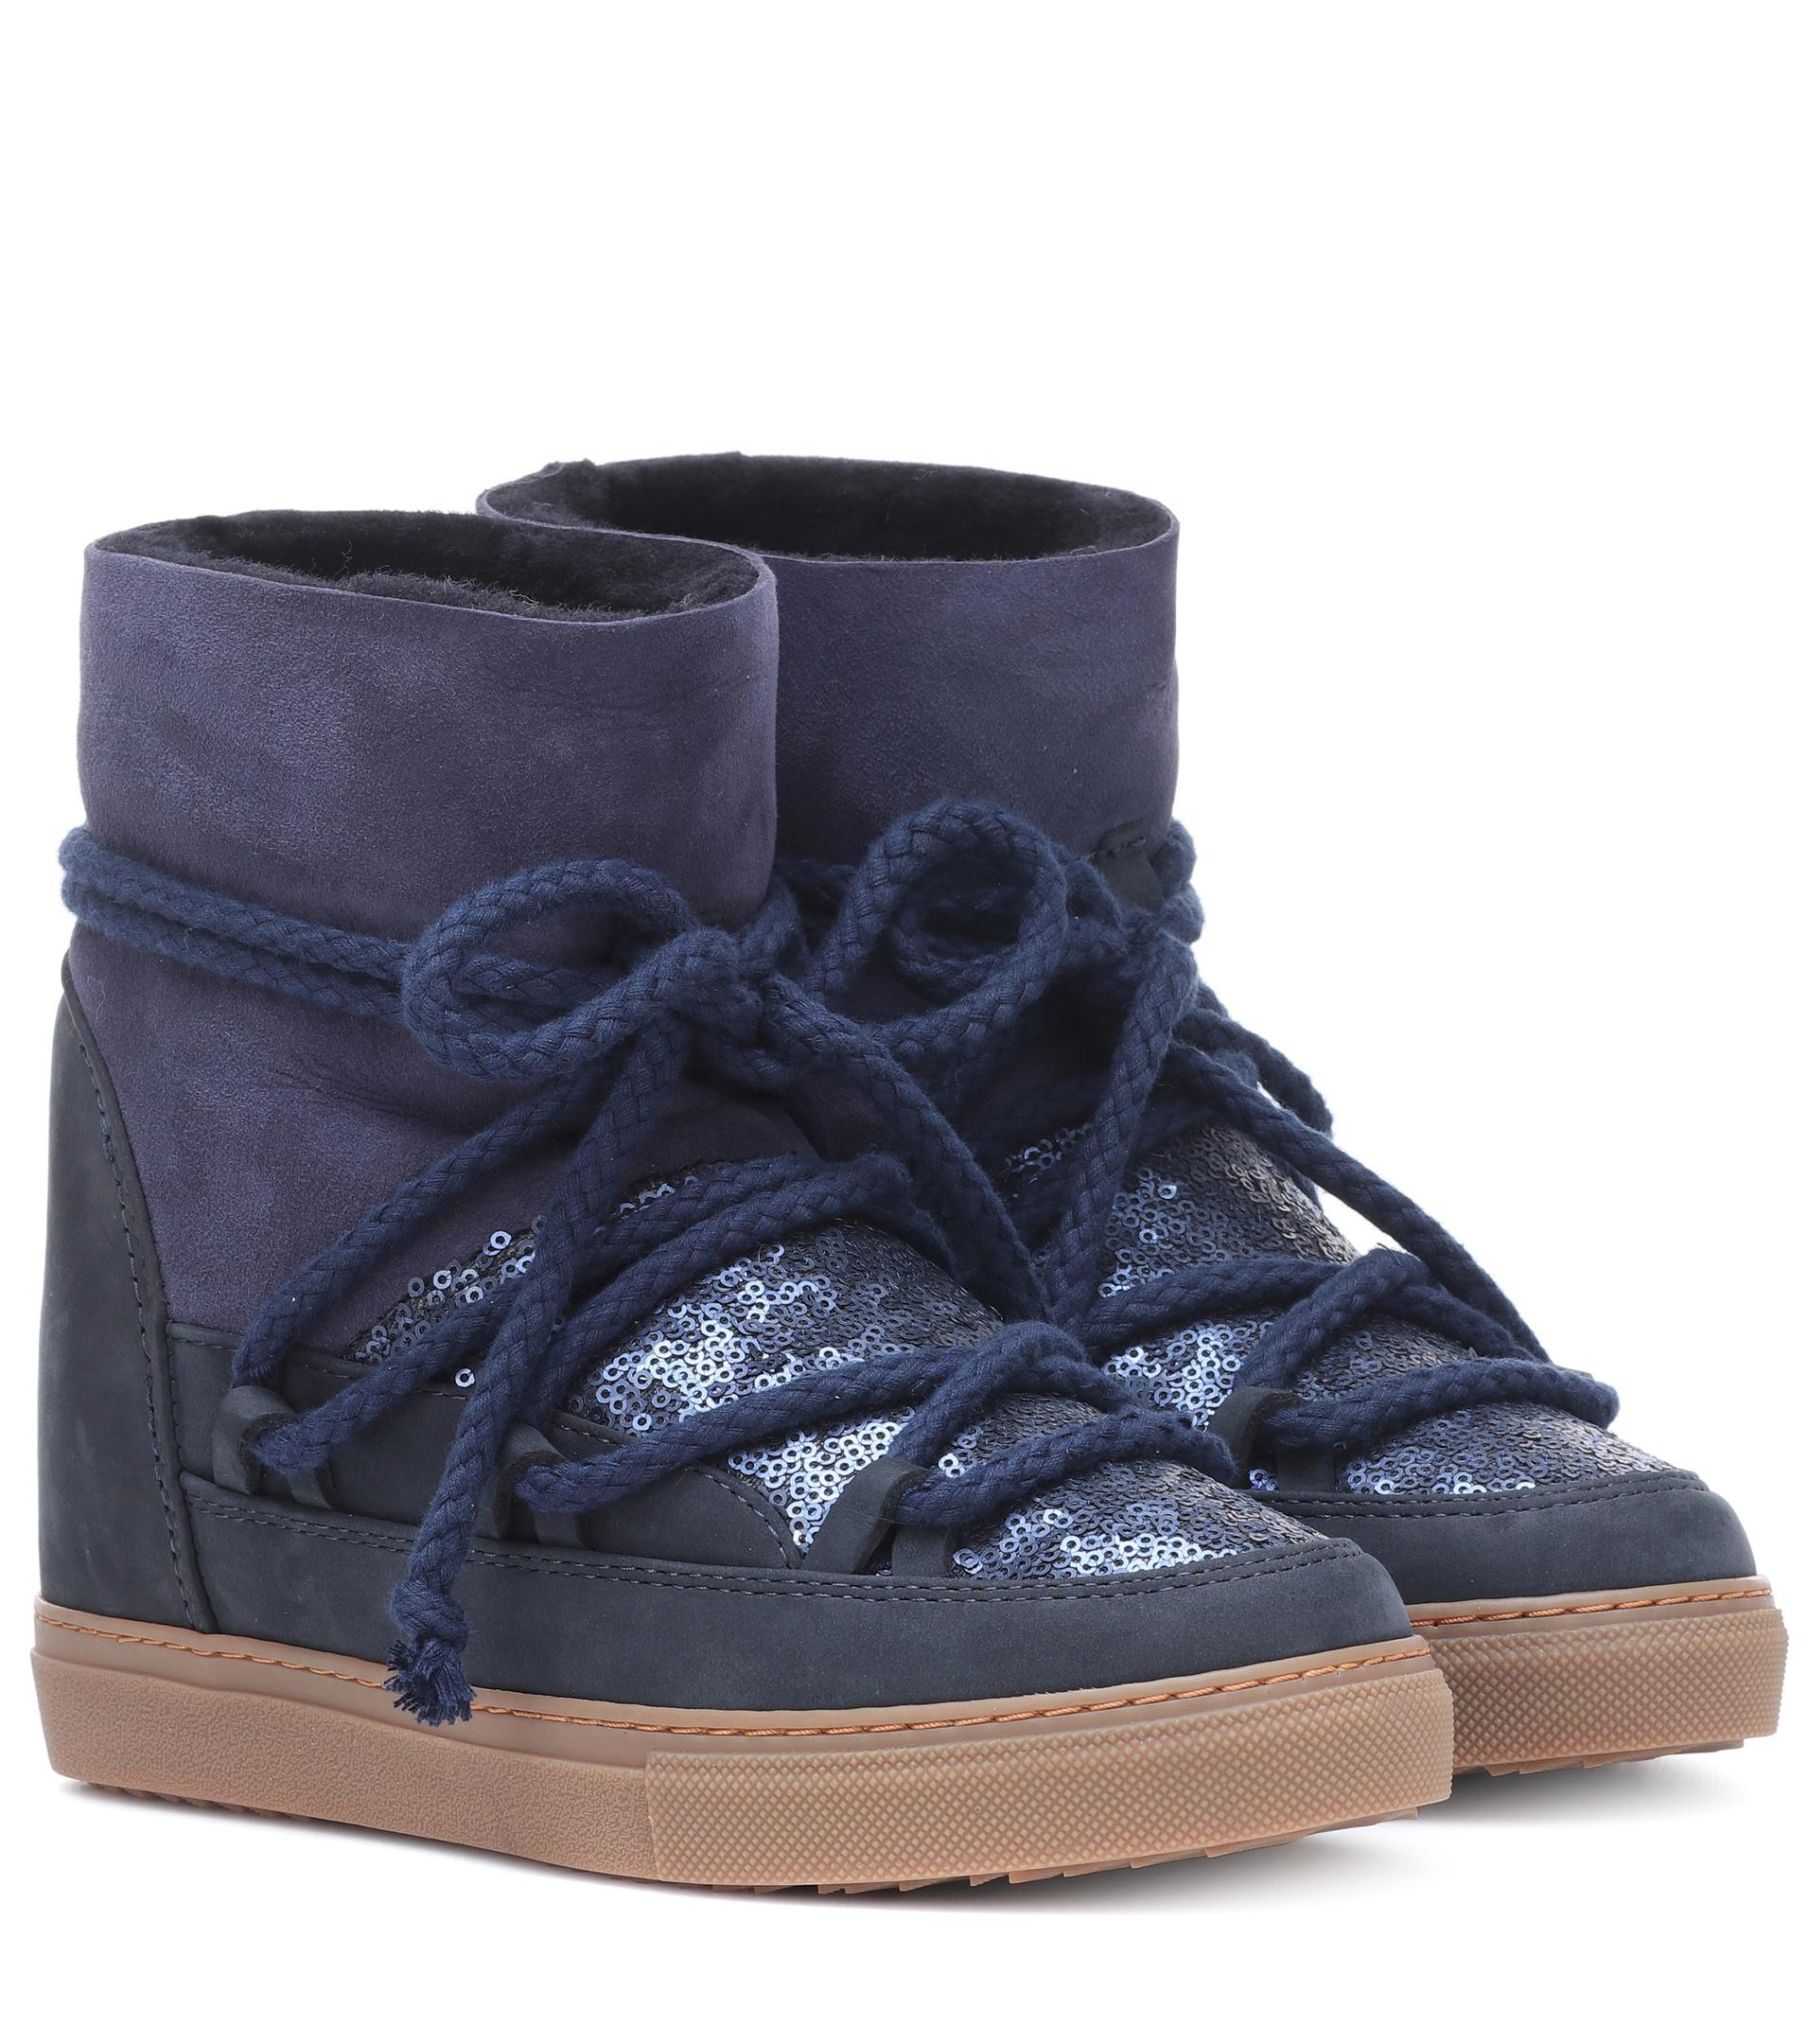 Bleu Lyst Daim Bottines Coloris Sneaker En Inuikii Sequin 8F4w8aqx